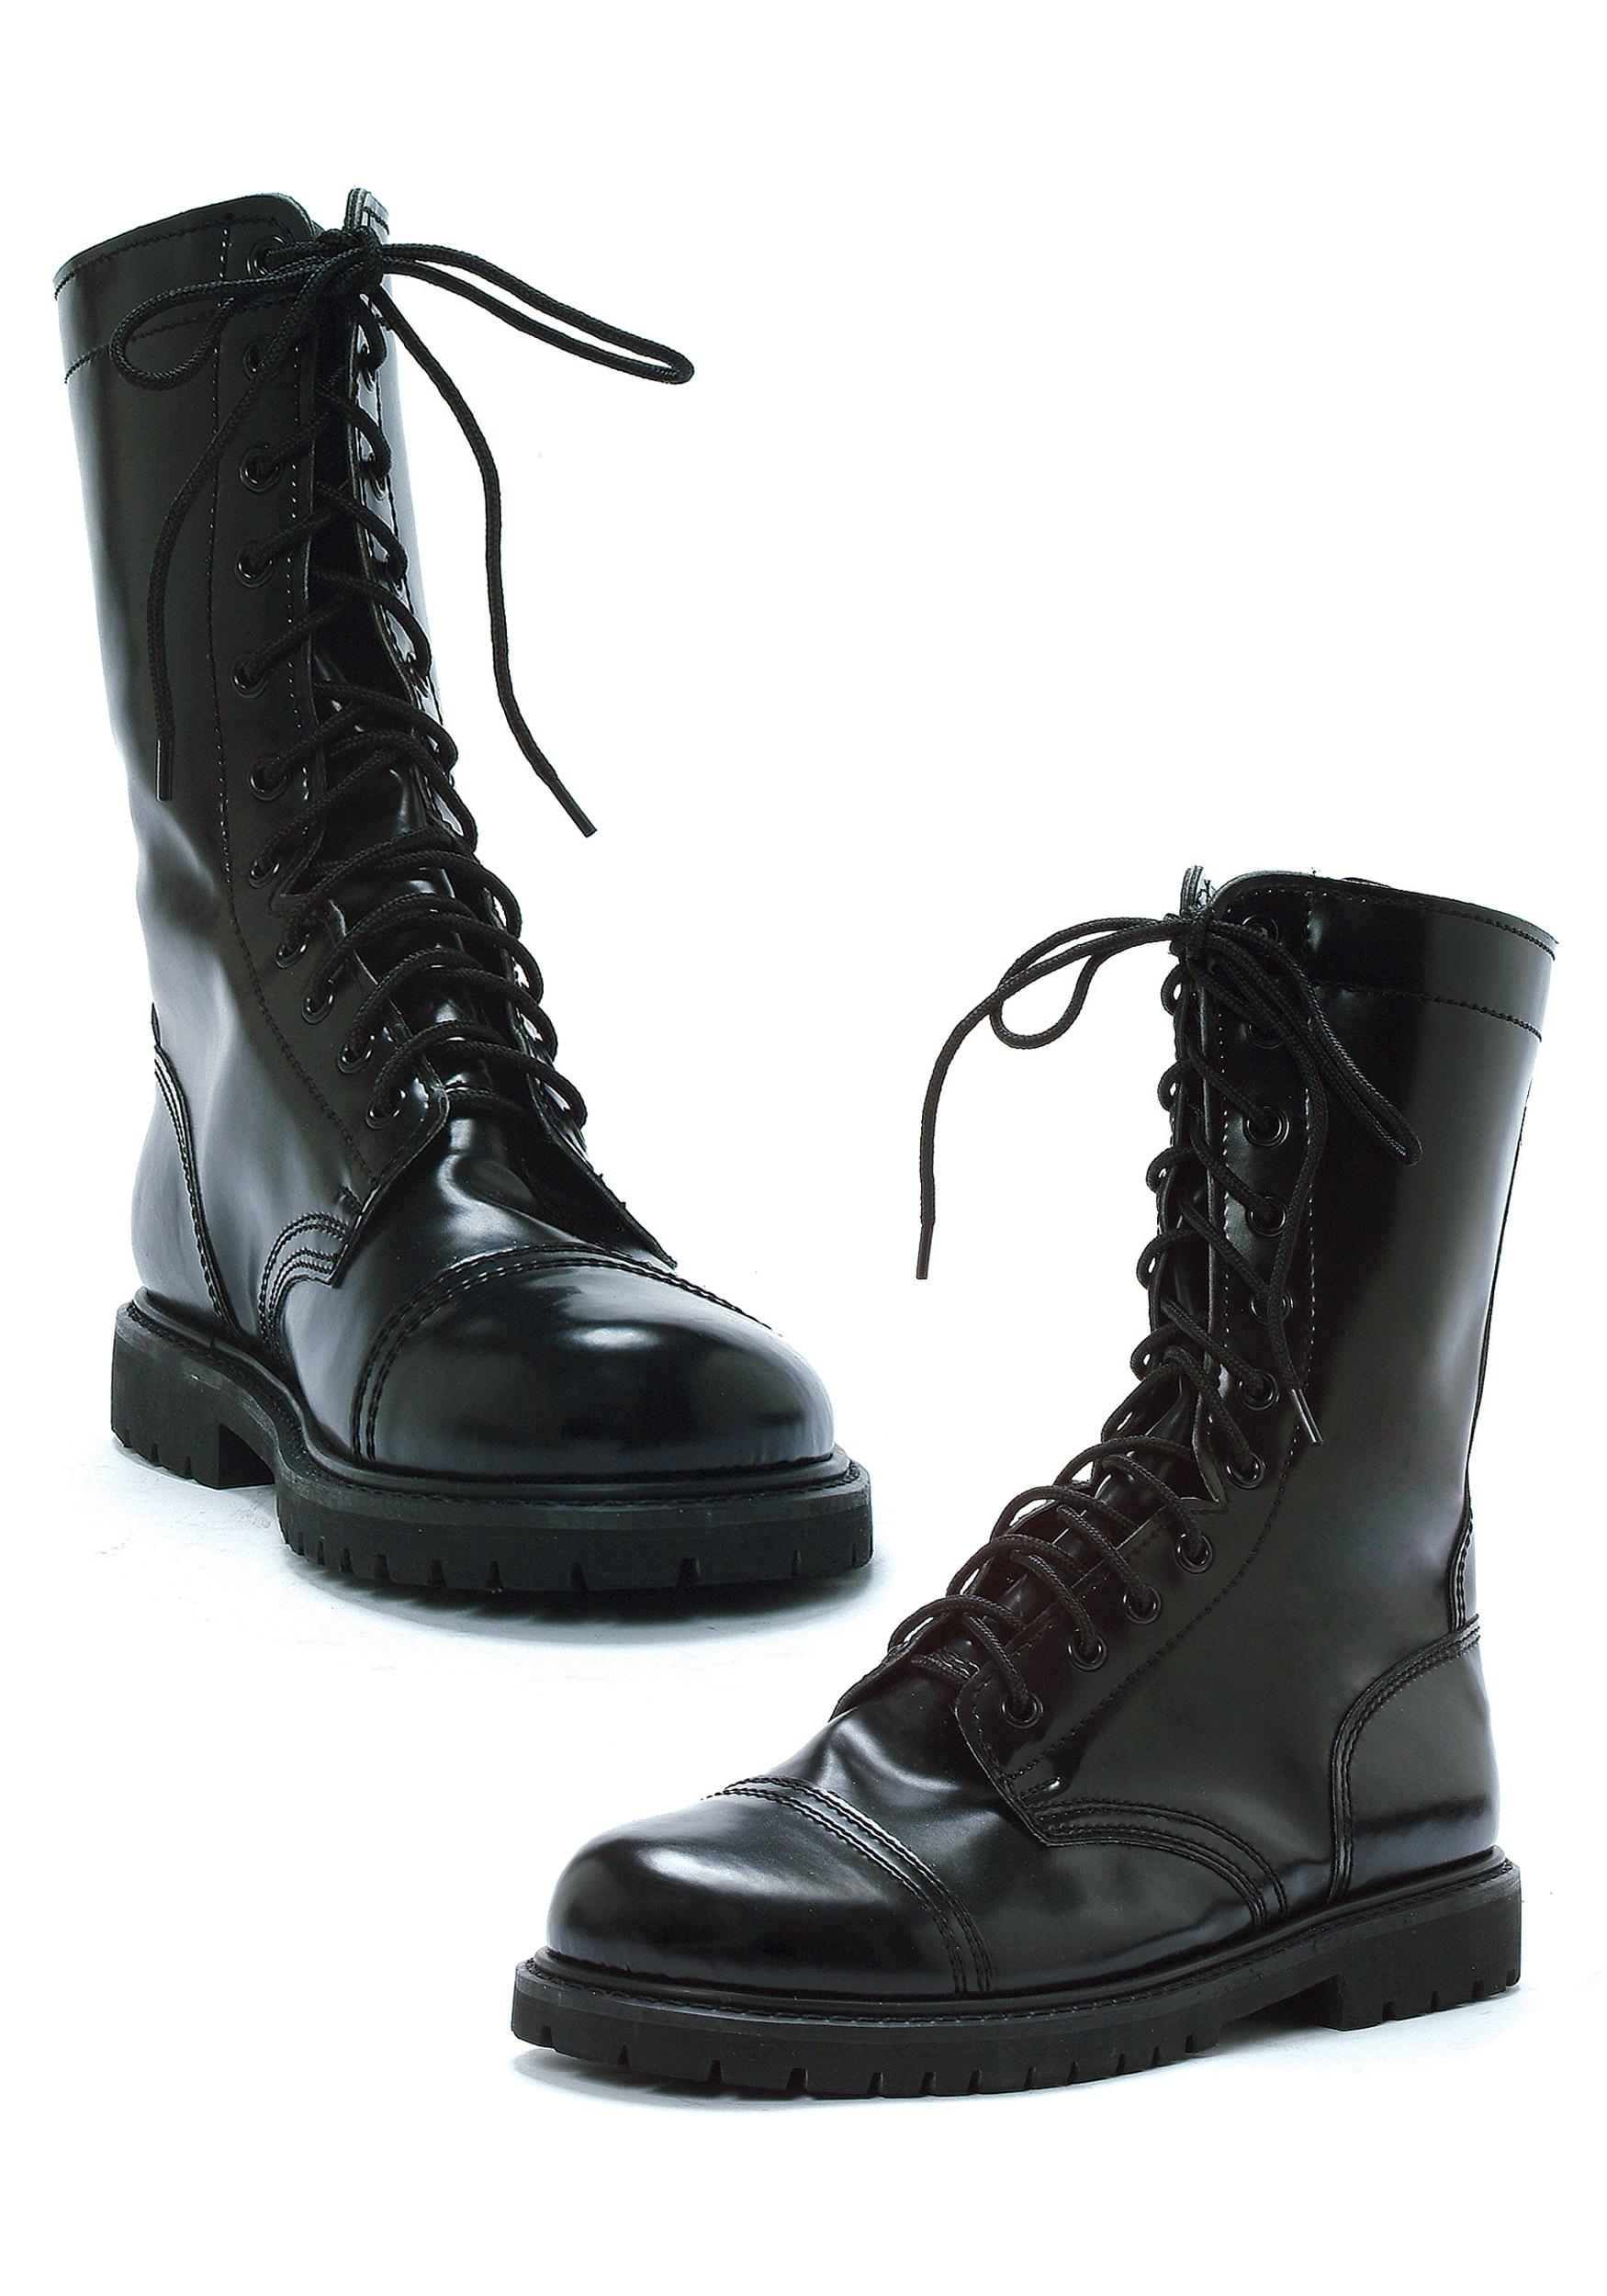 black boots adult black combat boots BFXVNML